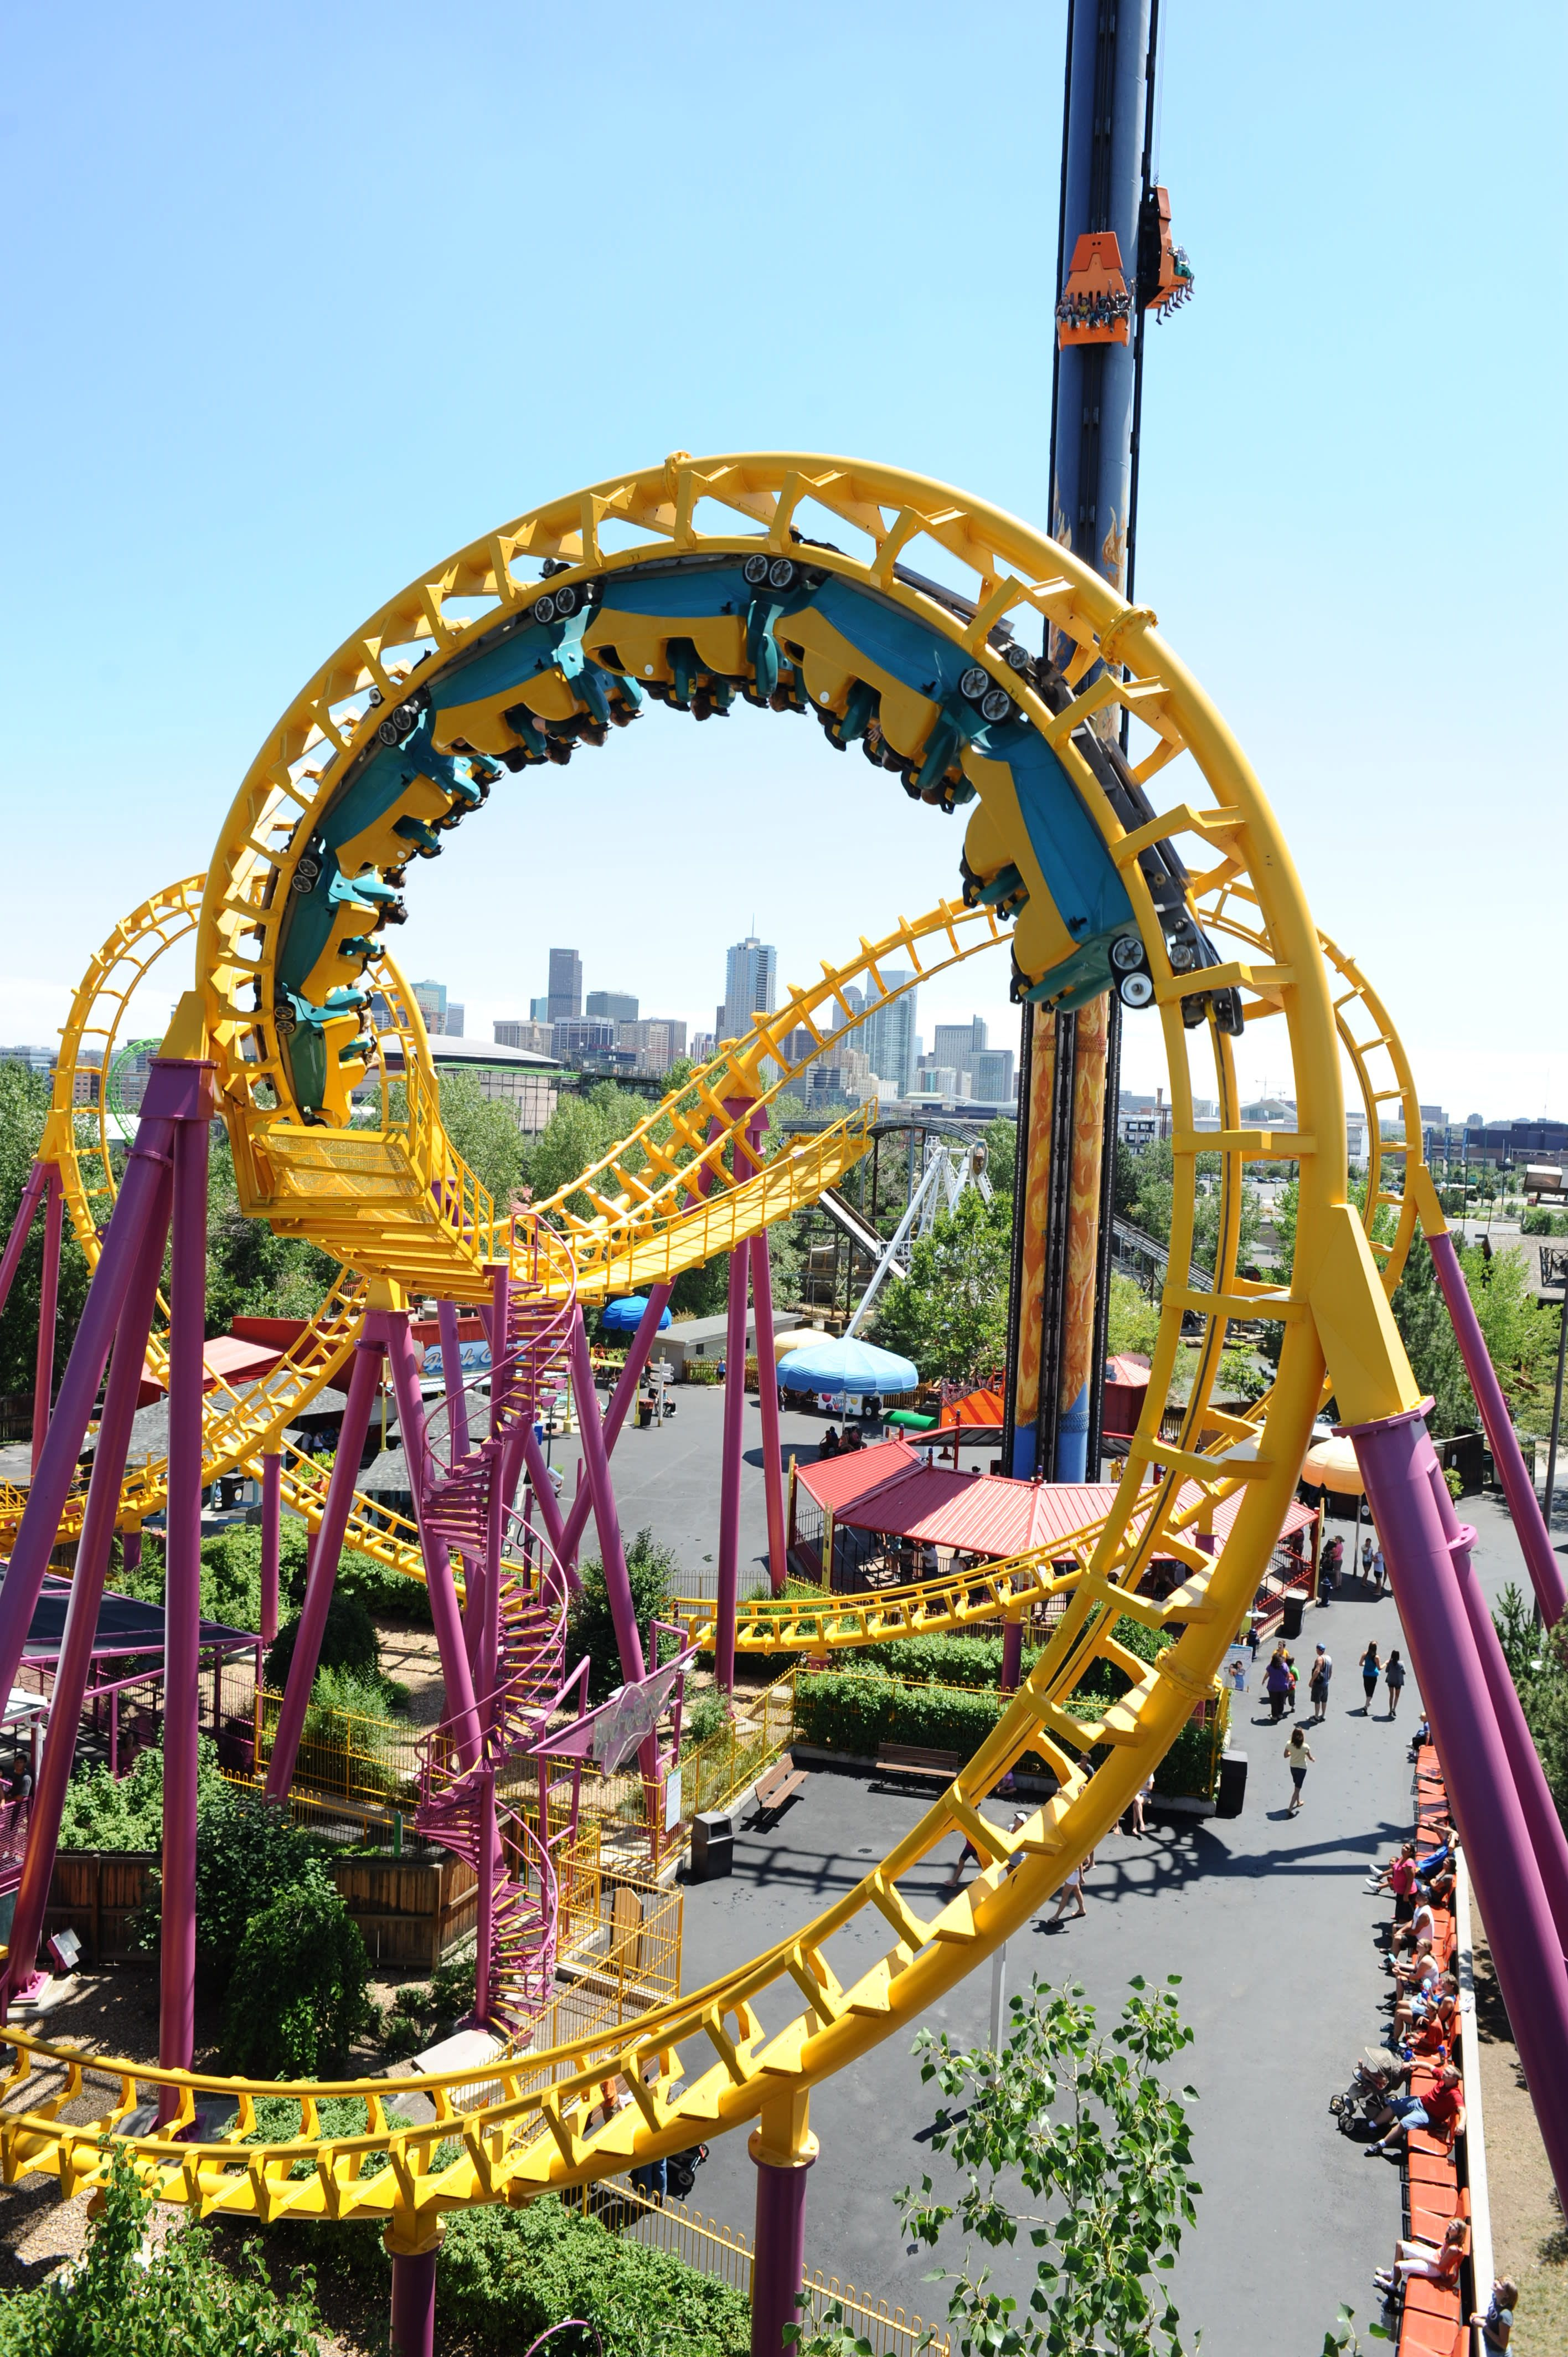 Denver Thrill Rides & Amusement Parks | VISIT DENVER